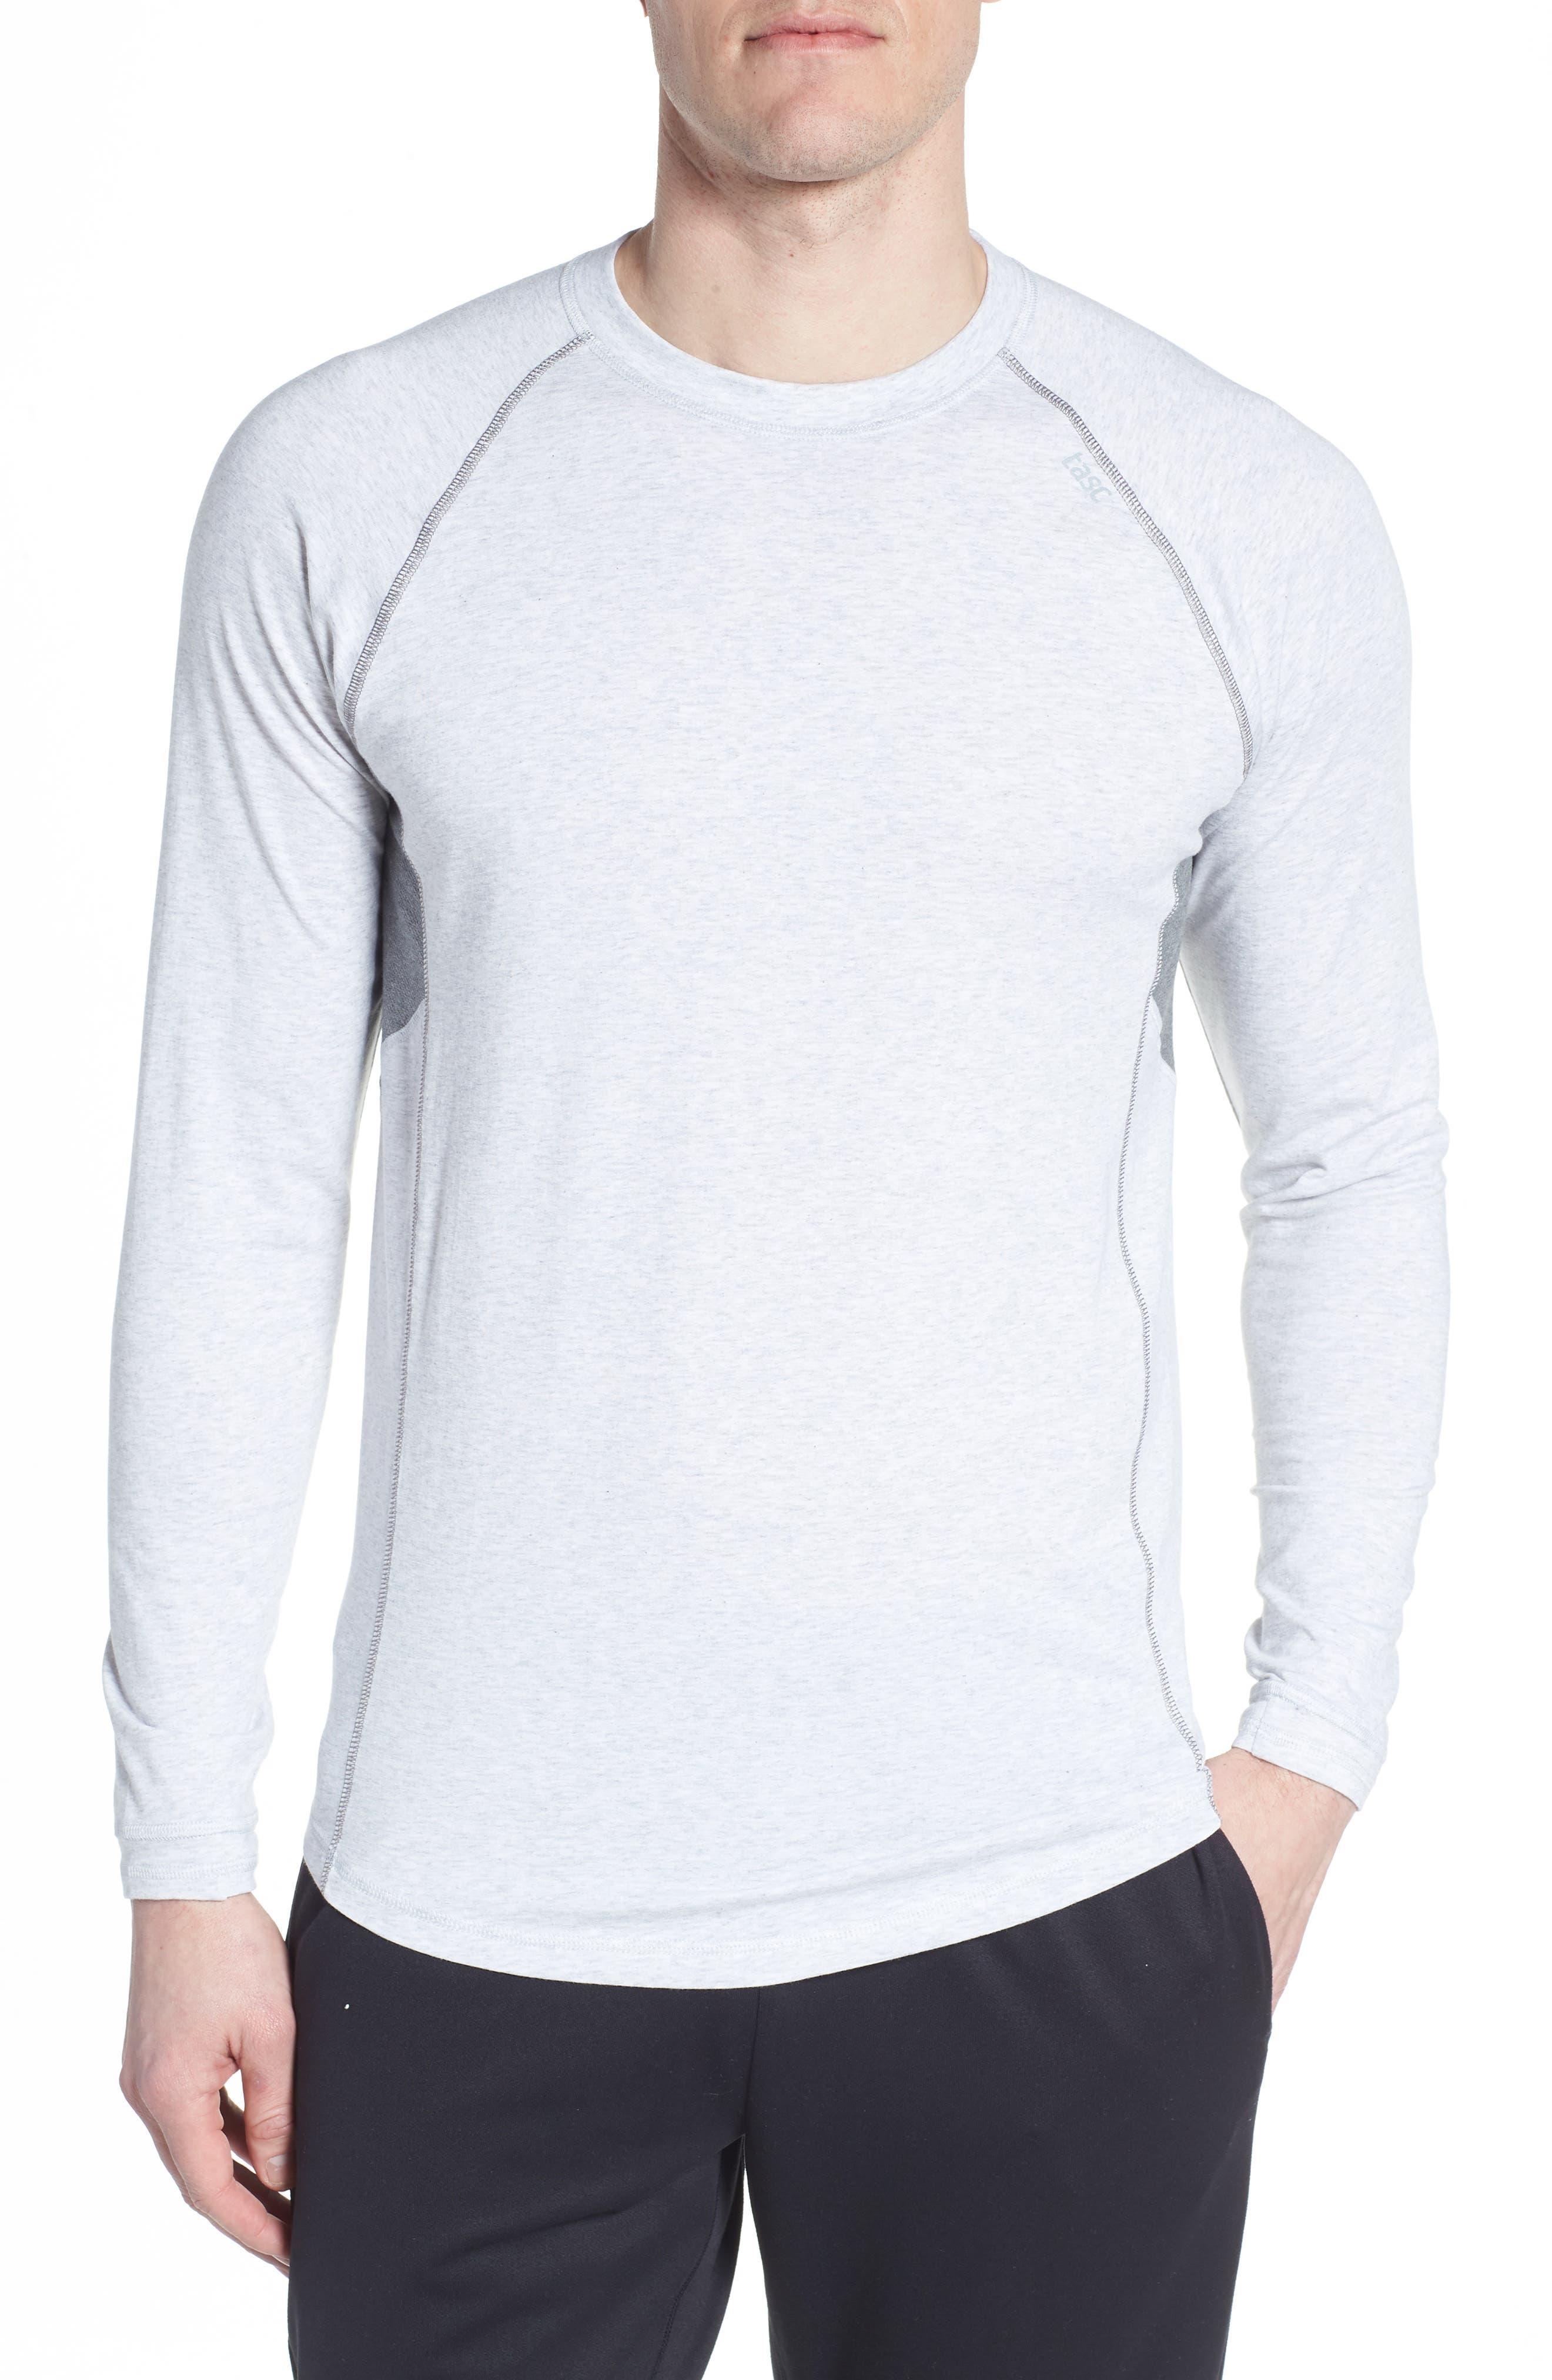 Charge II Long Sleeve Shirt,                             Main thumbnail 1, color,                             Light Heather Gray